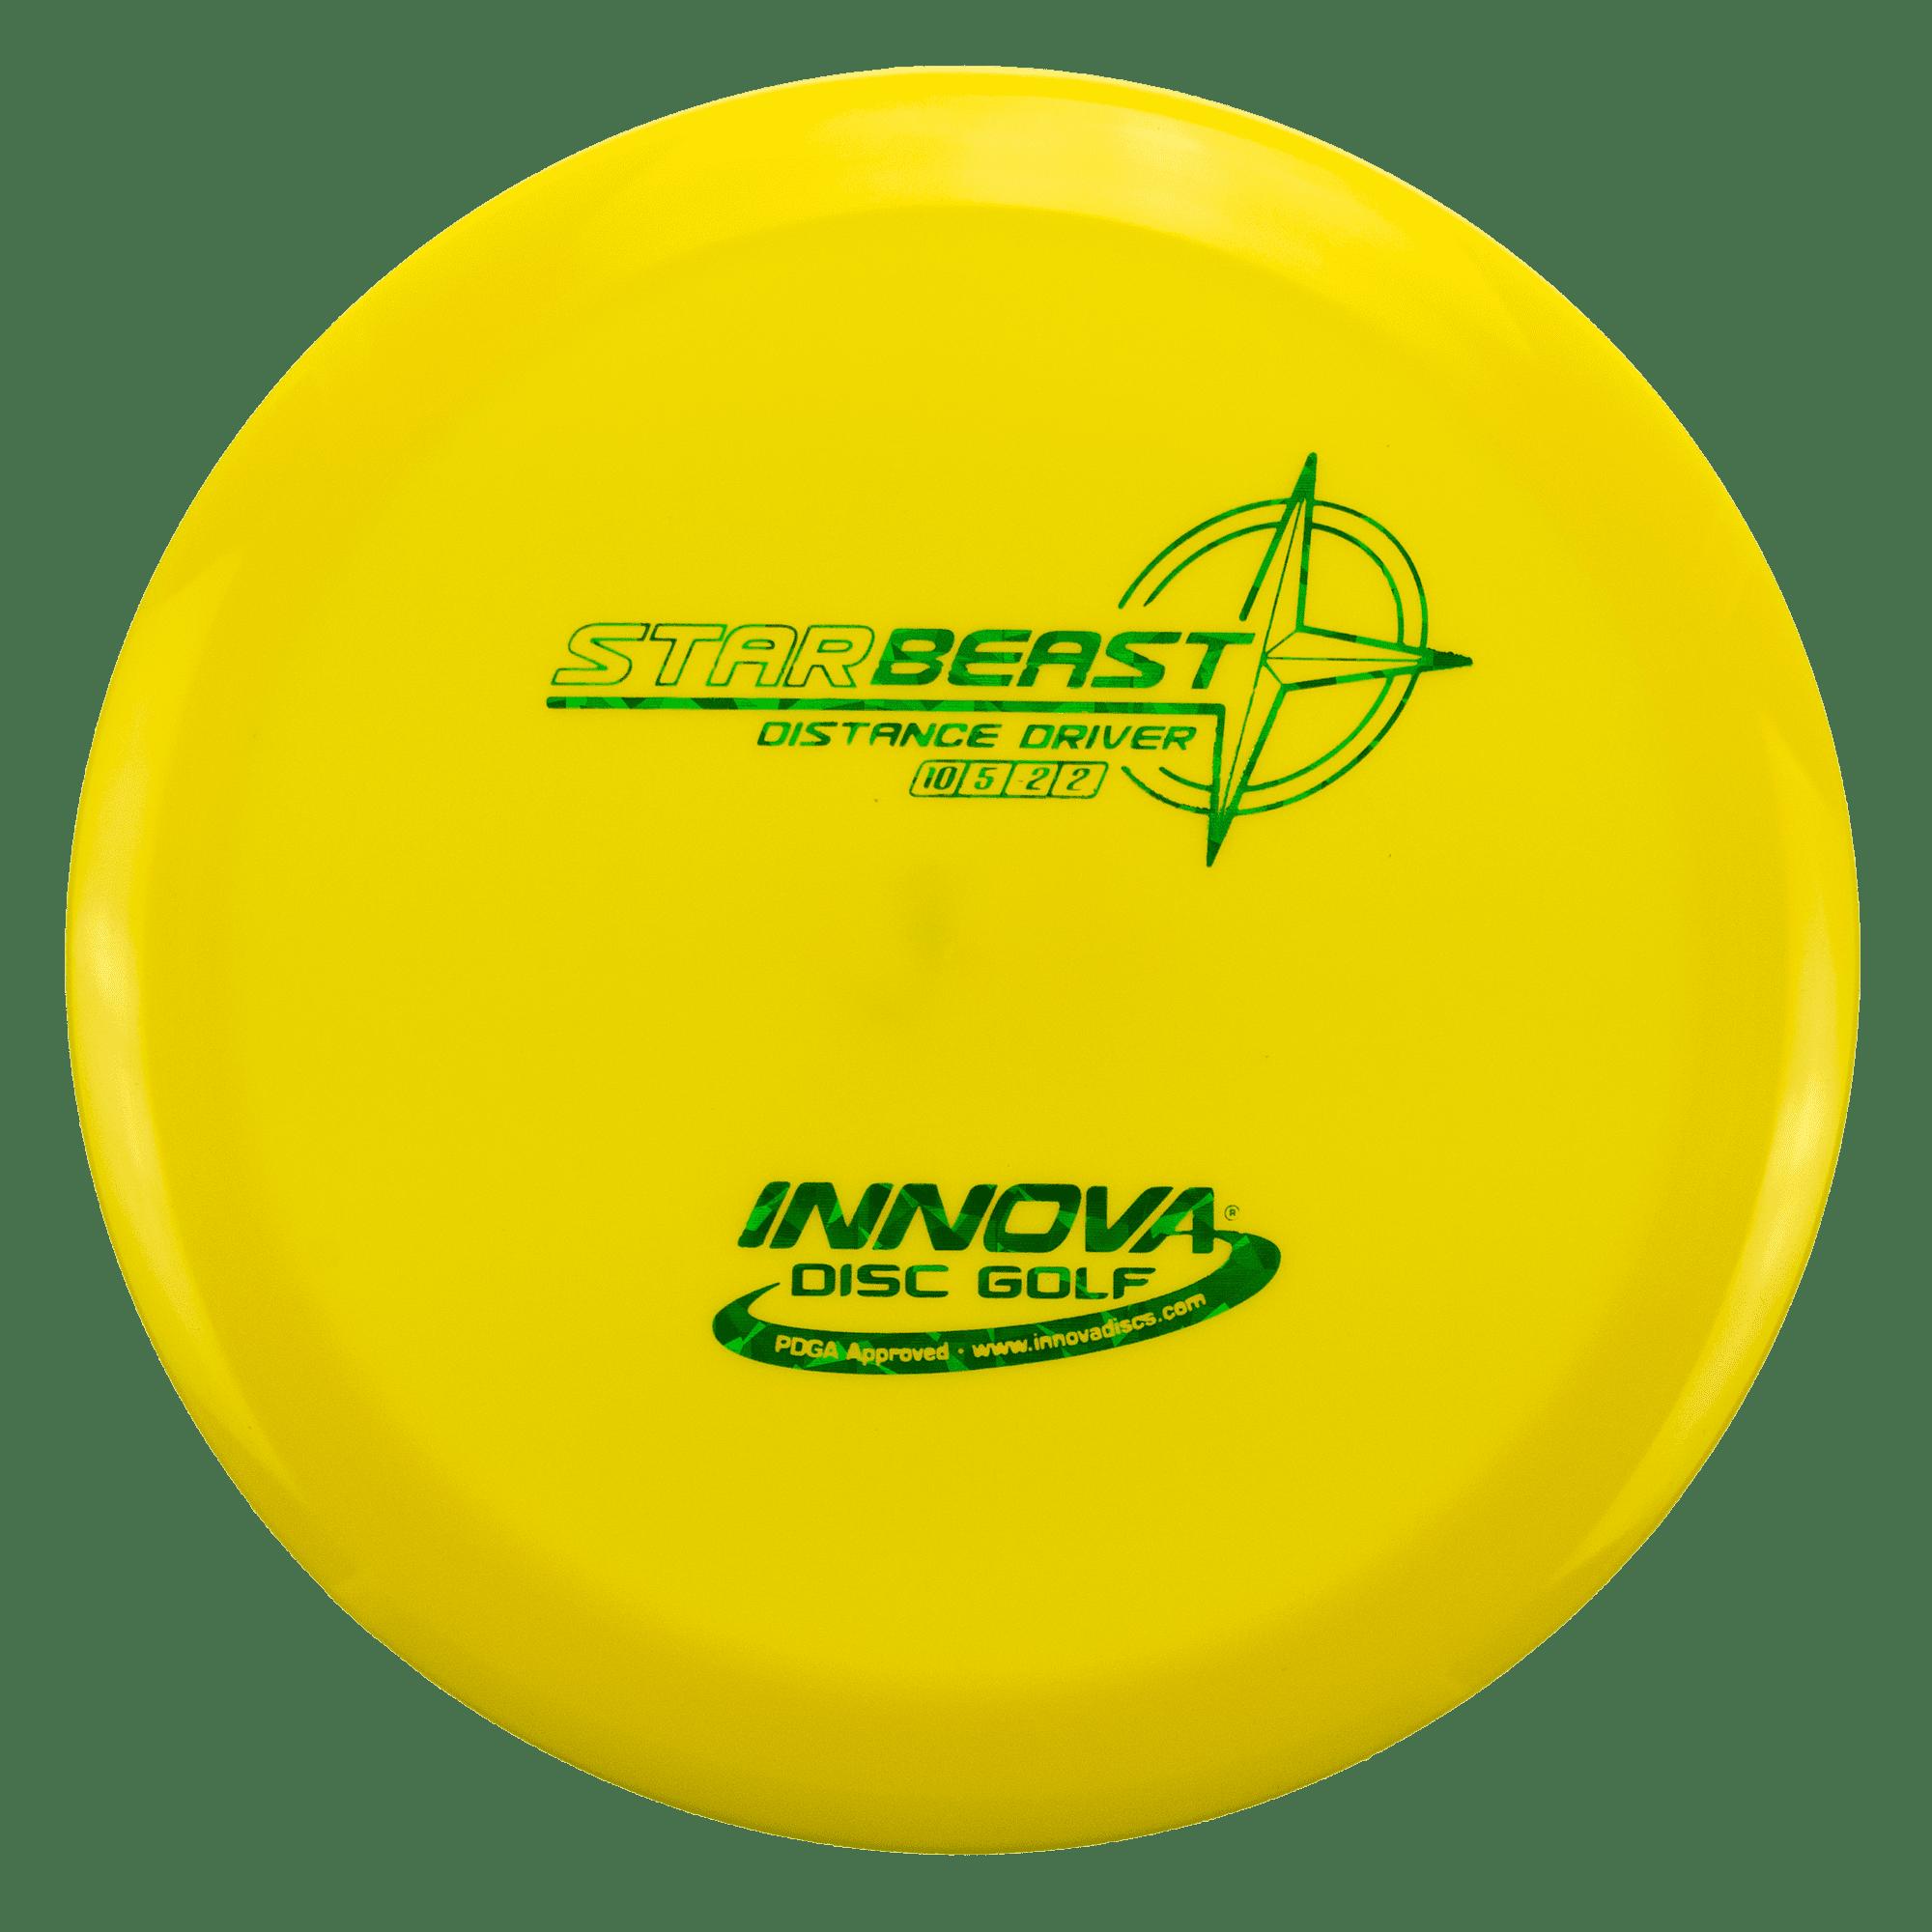 Innova Discs - Star Beast Disc Golf Driver - Walmart.com ...